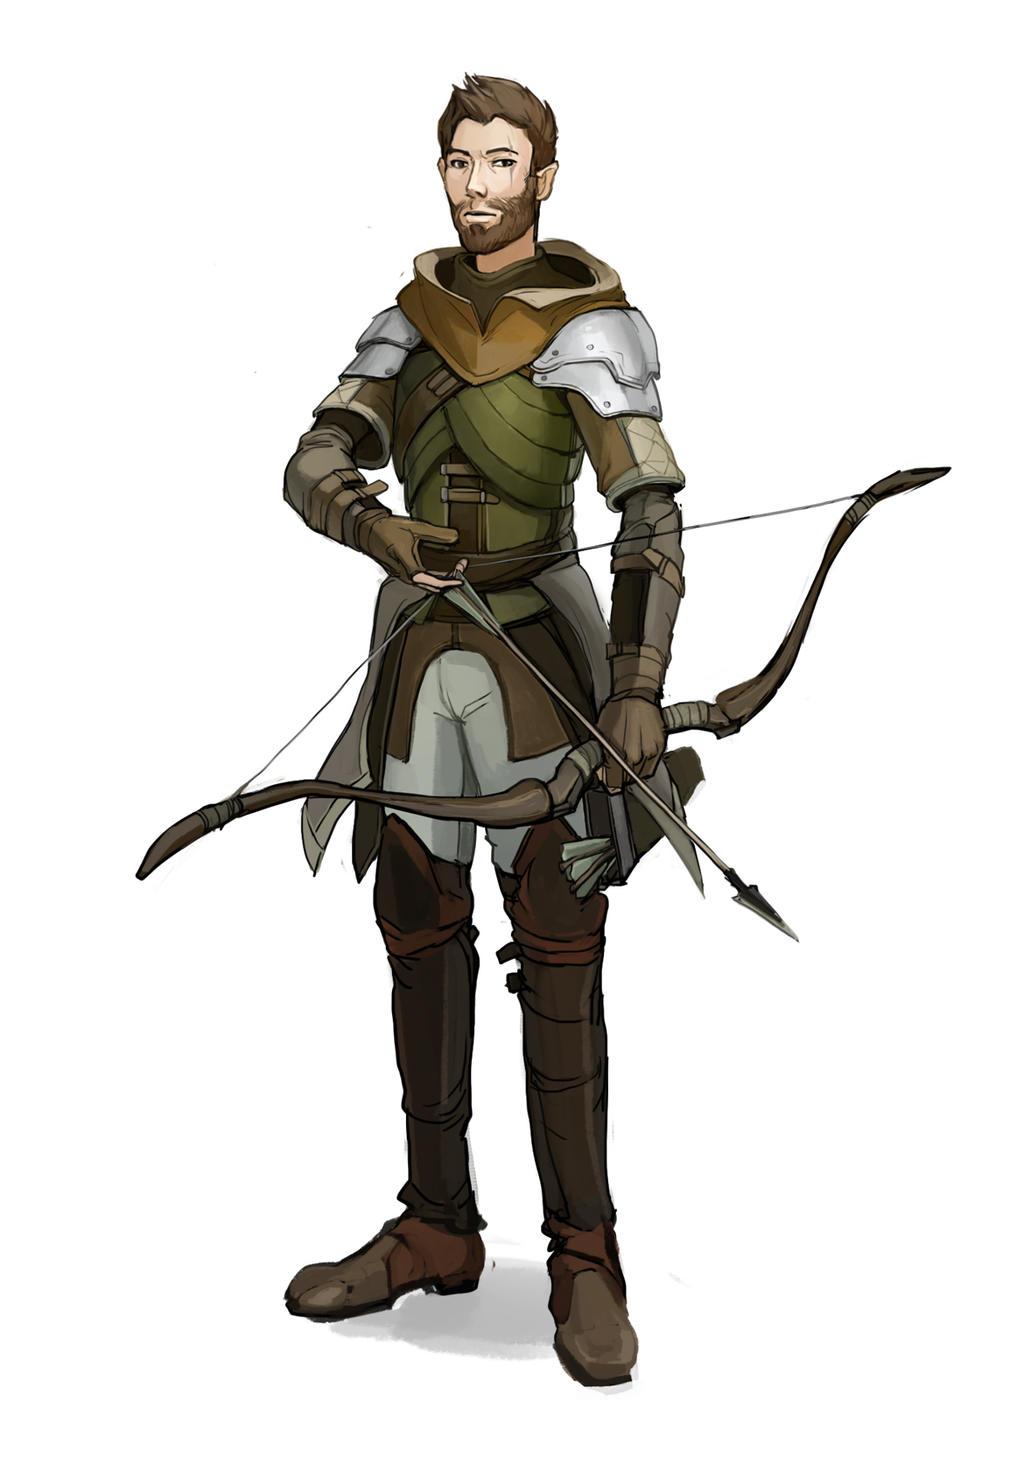 commision: half elf ranger by Shagan-fury on DeviantArt